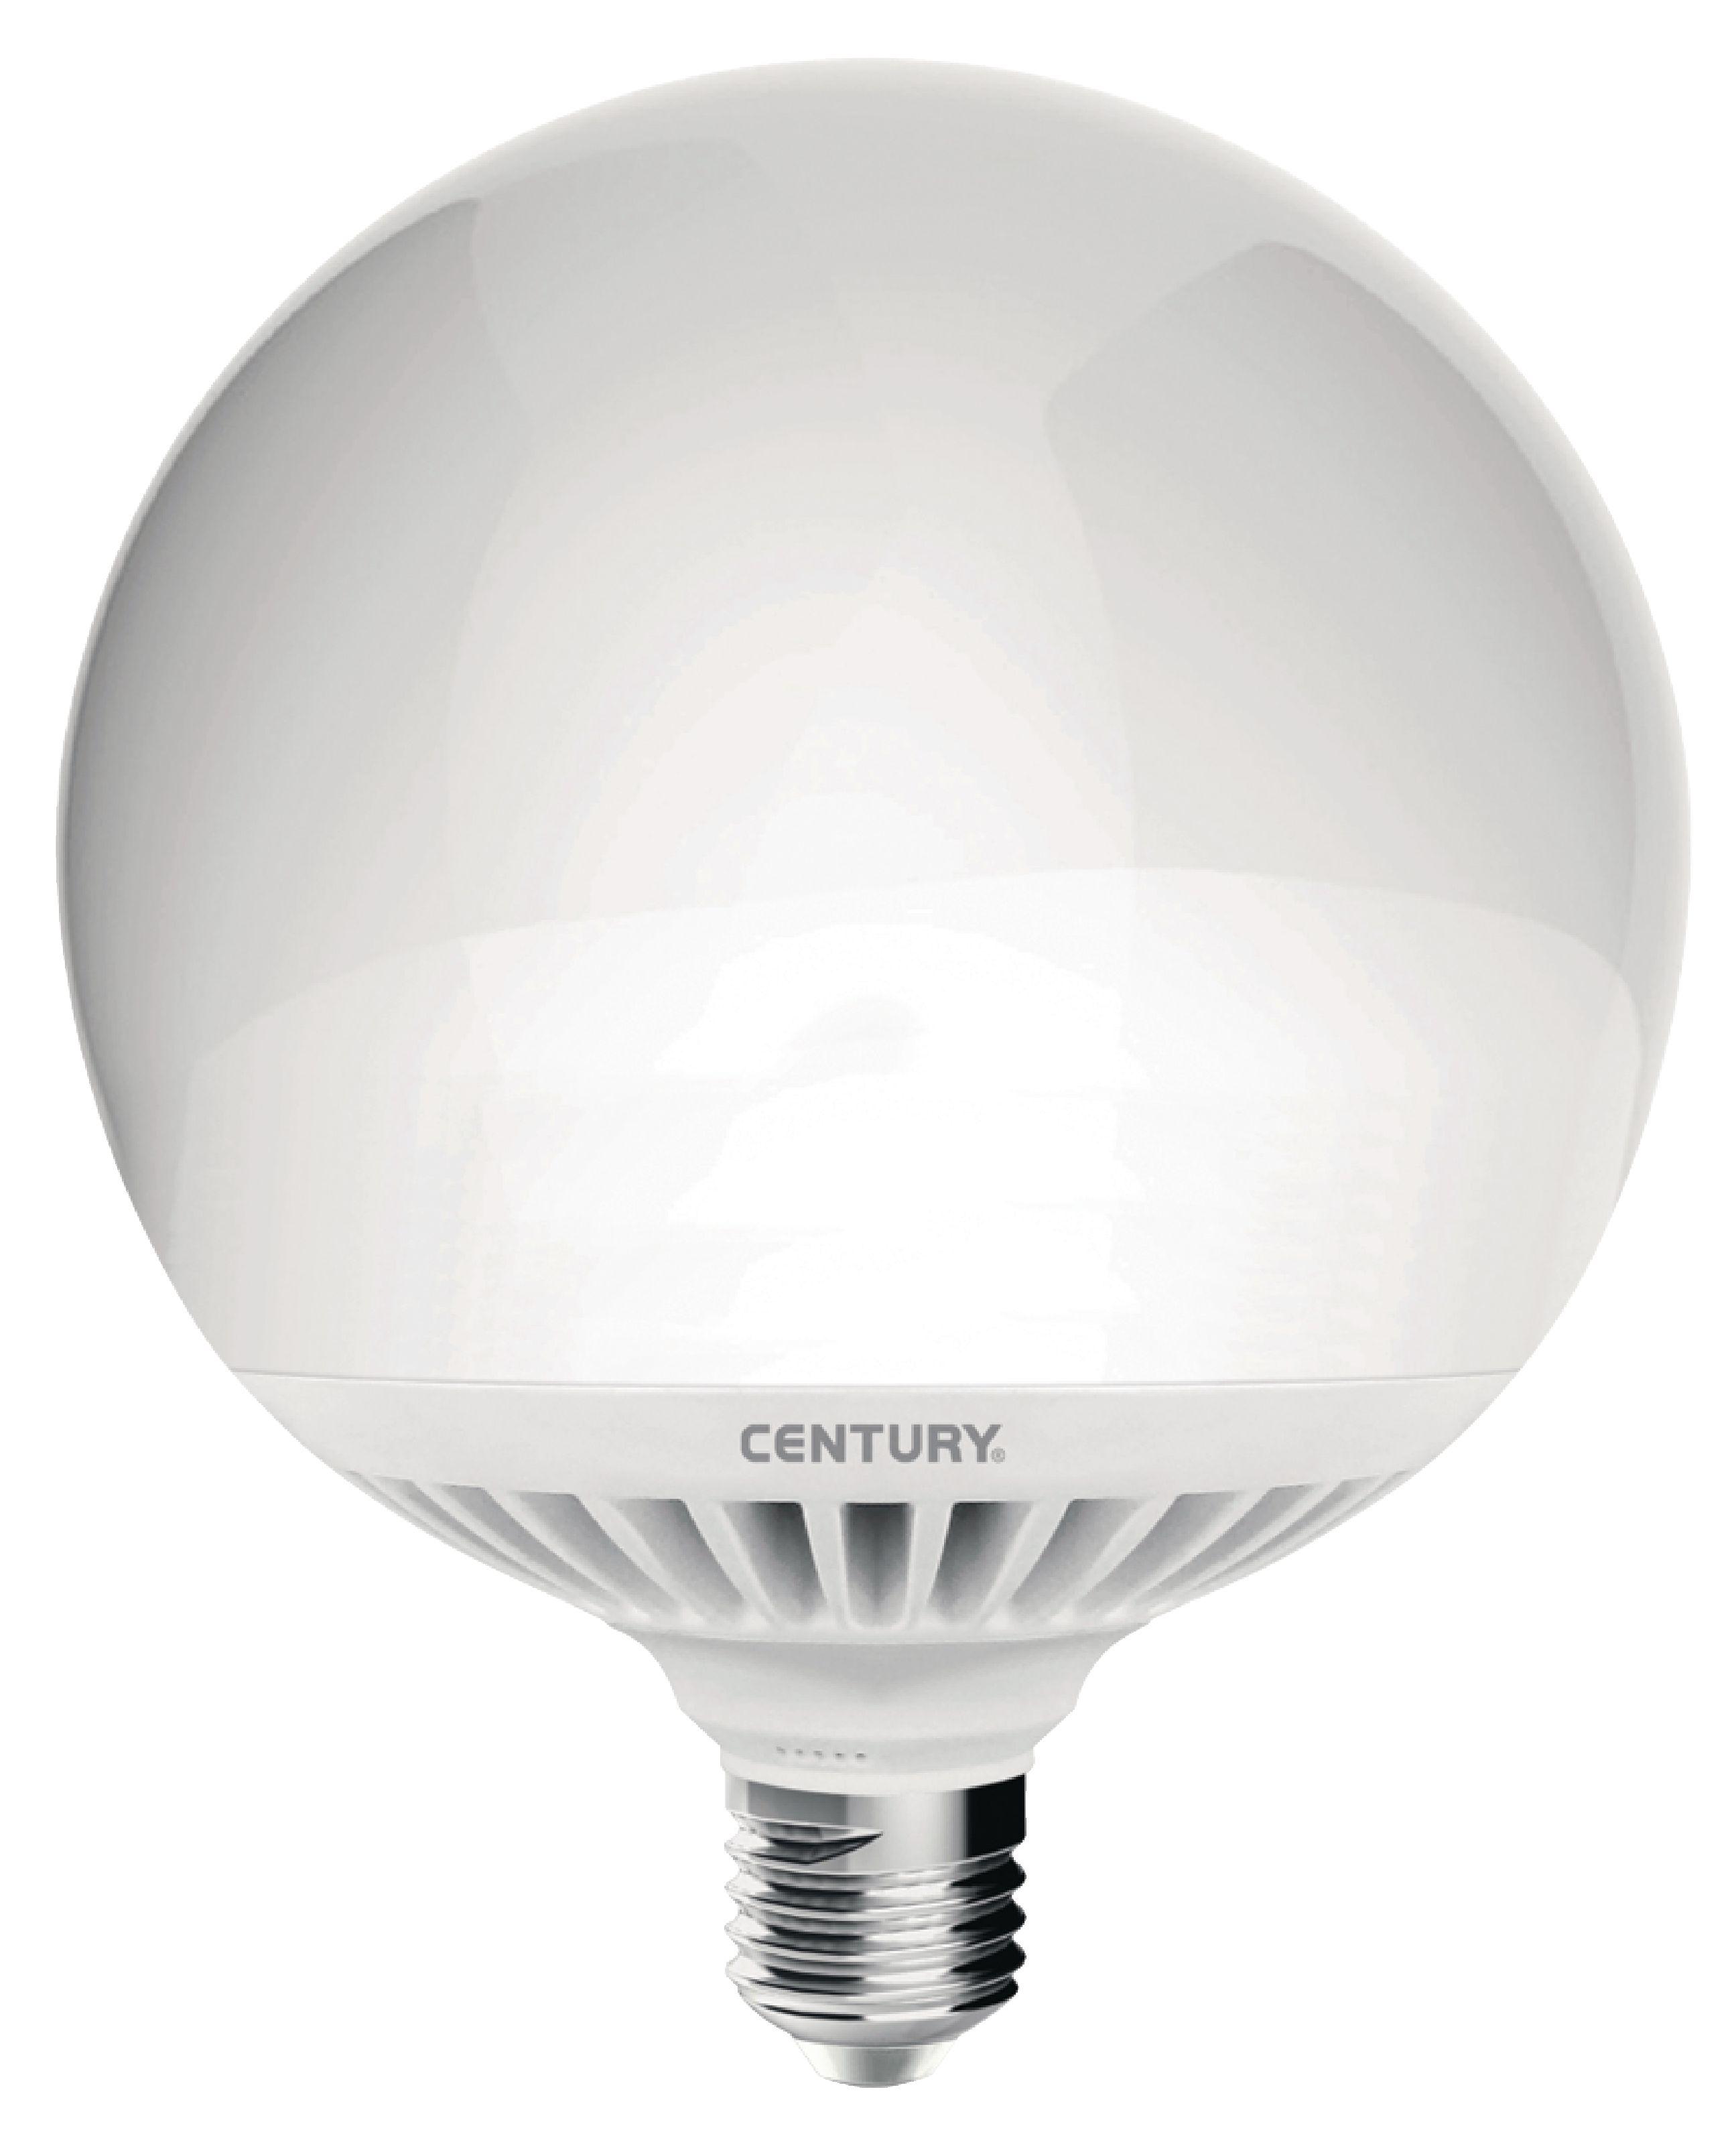 LED-Lampe E27 Globe 24 W 2100 lm 3000 K